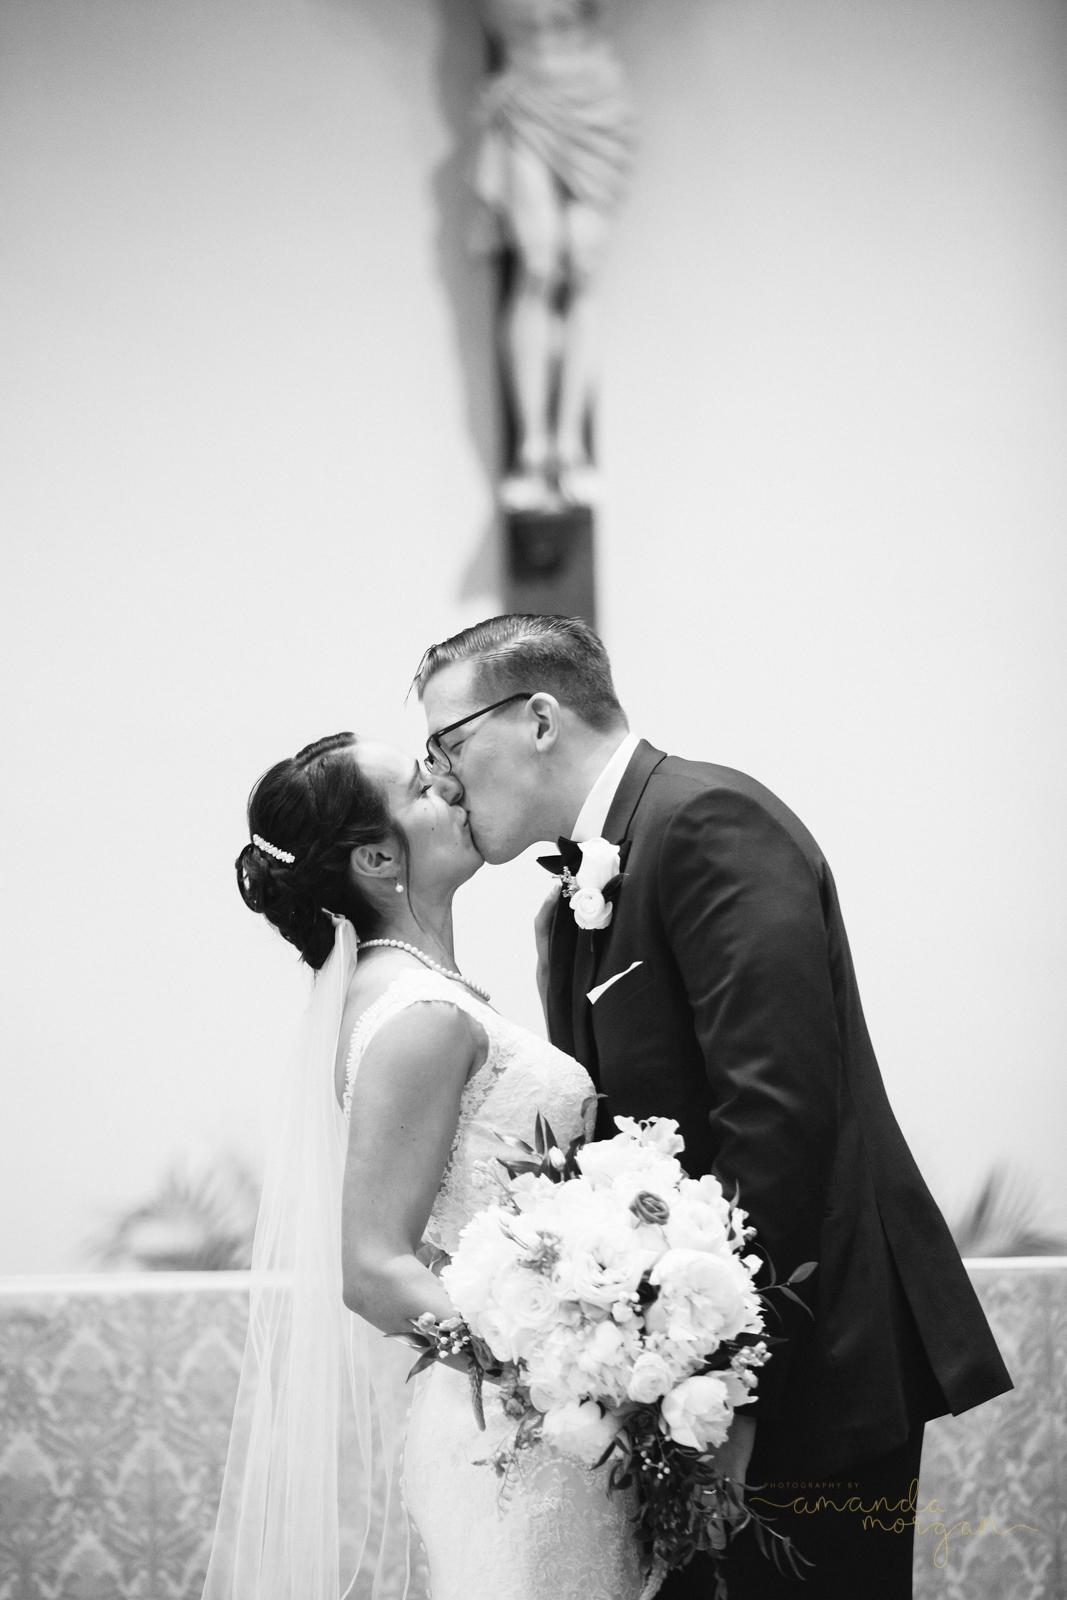 Notre-Dame-Catholic-Church-Wedding-Amanda-Morgan-7.jpg